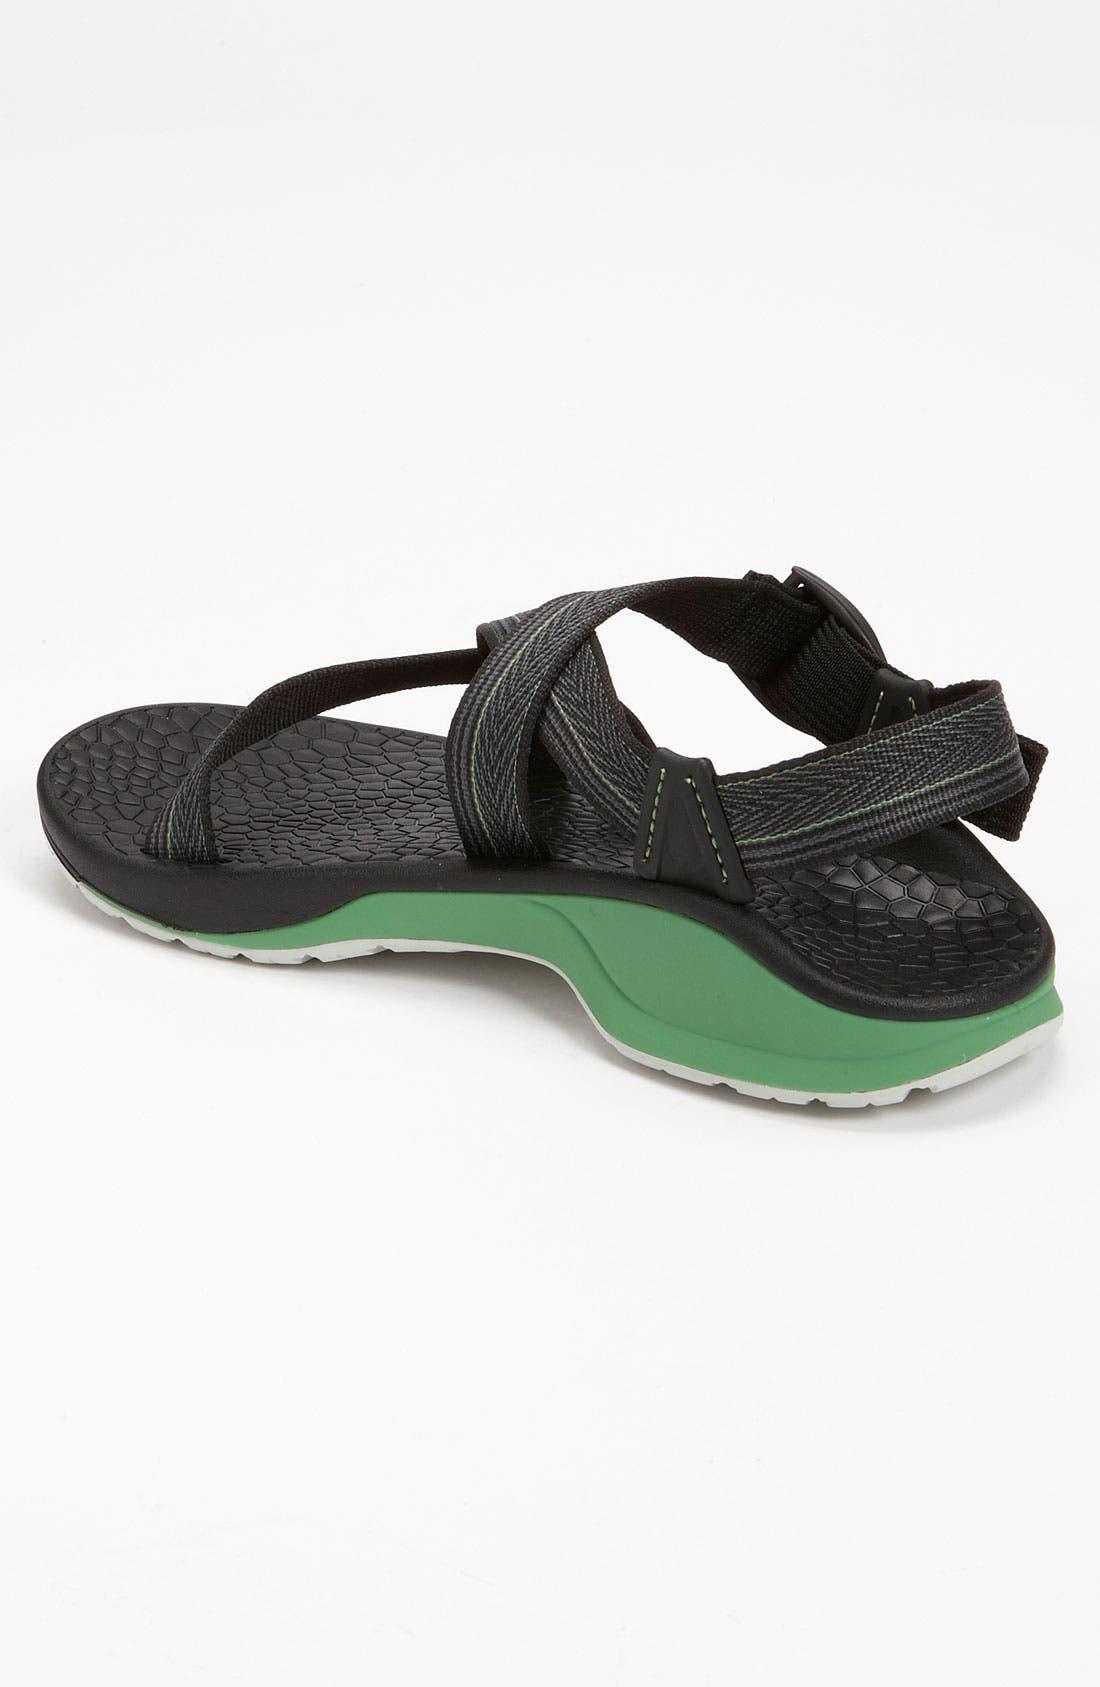 Alternate Image 2  - Chaco 'Updraft' Sandal